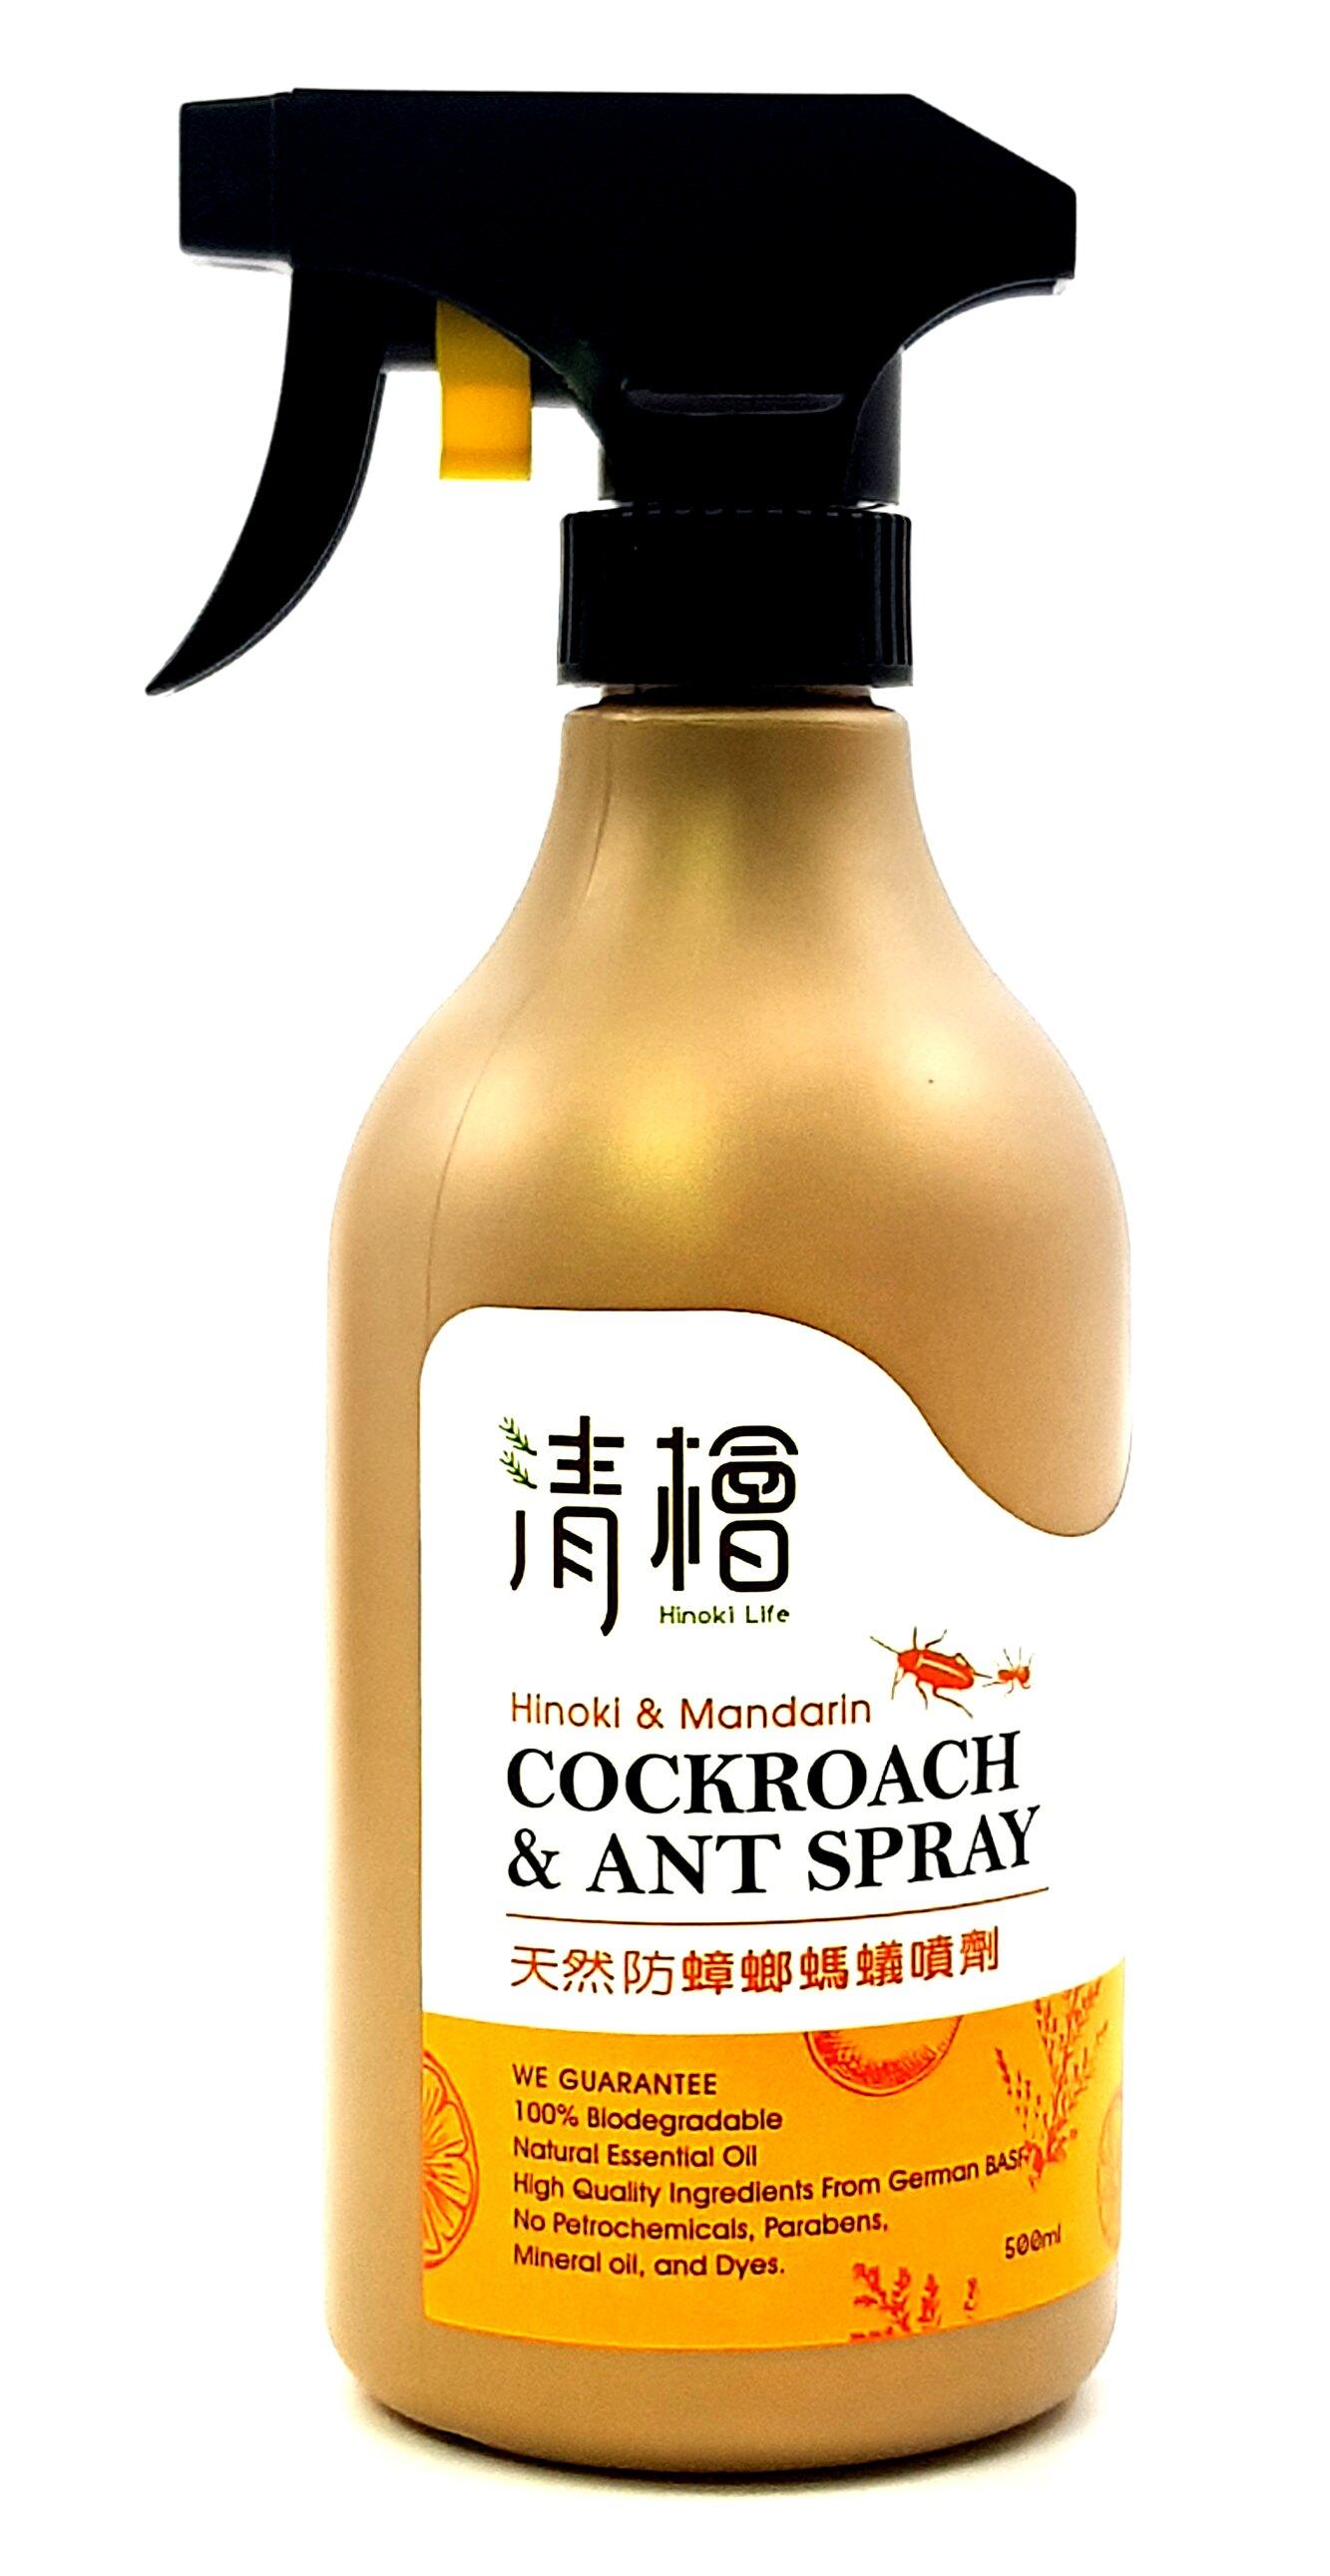 《Chara 微百貨》 台灣 清檜 天然 驅蟲 防蟑 蟑螂 螞蟻 噴劑 萬用 清潔劑 團購 批發